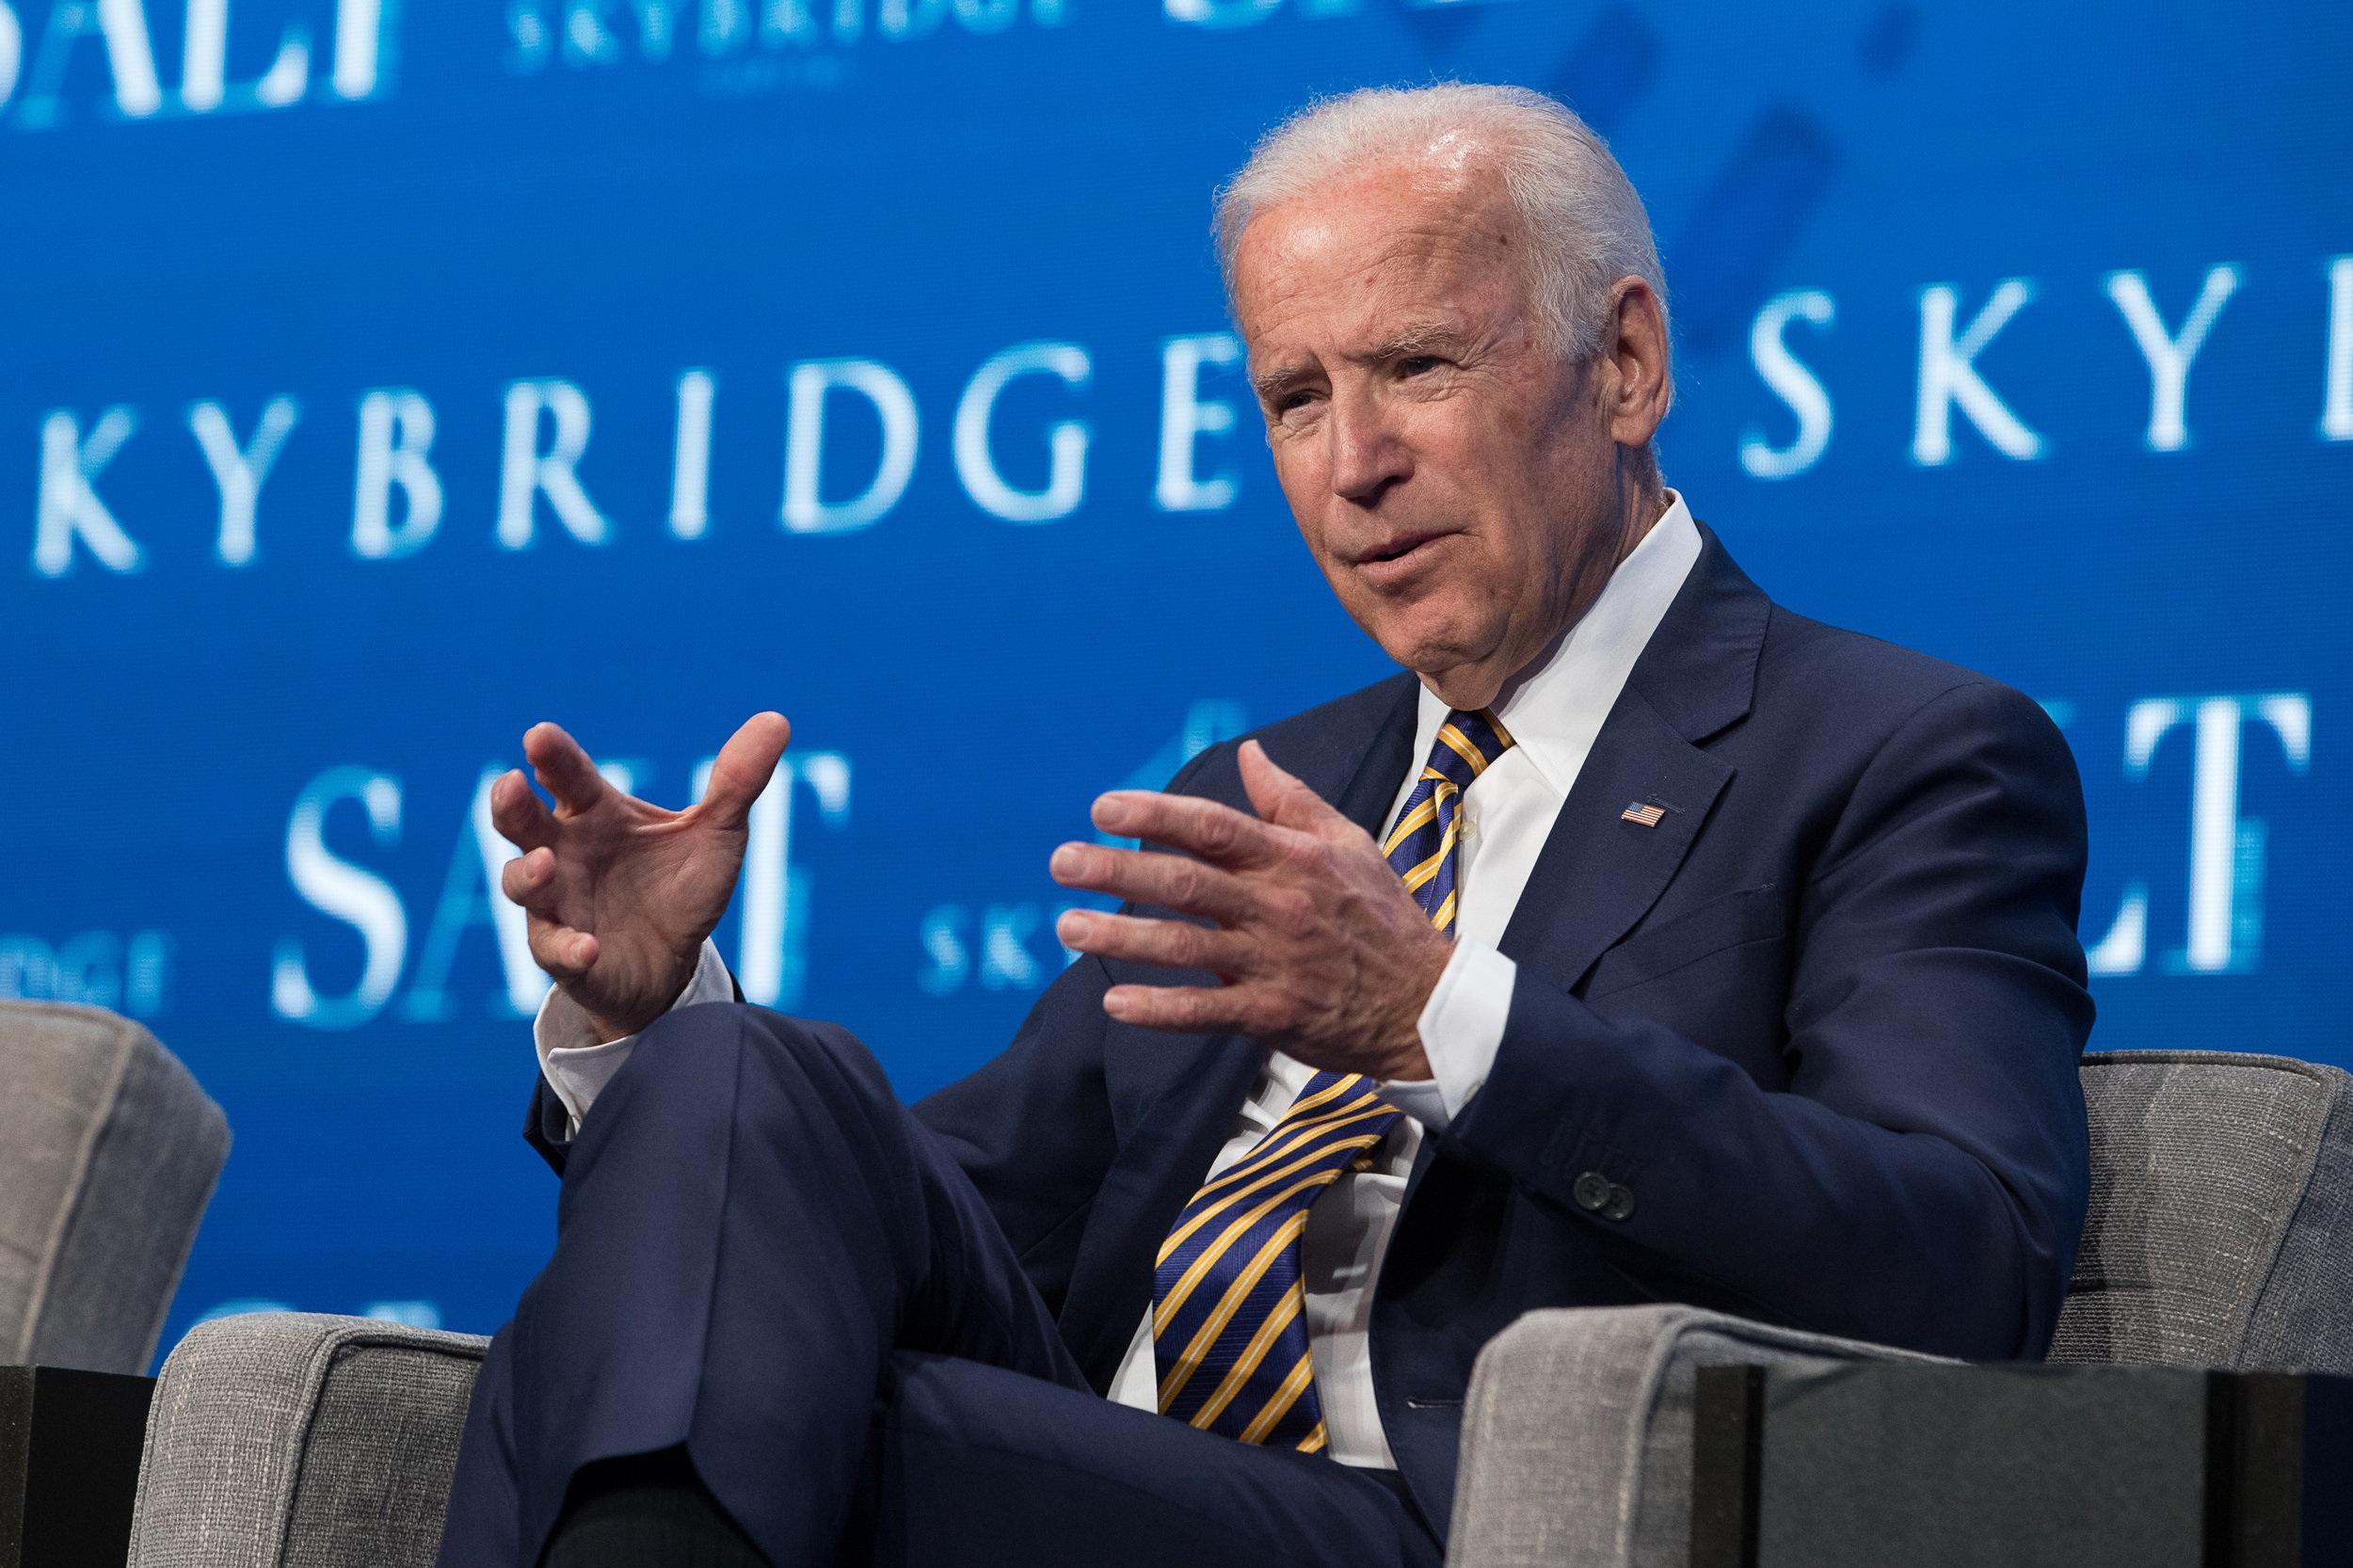 SALT 2017 - 47th Vice President of the United States JOE BIDEN